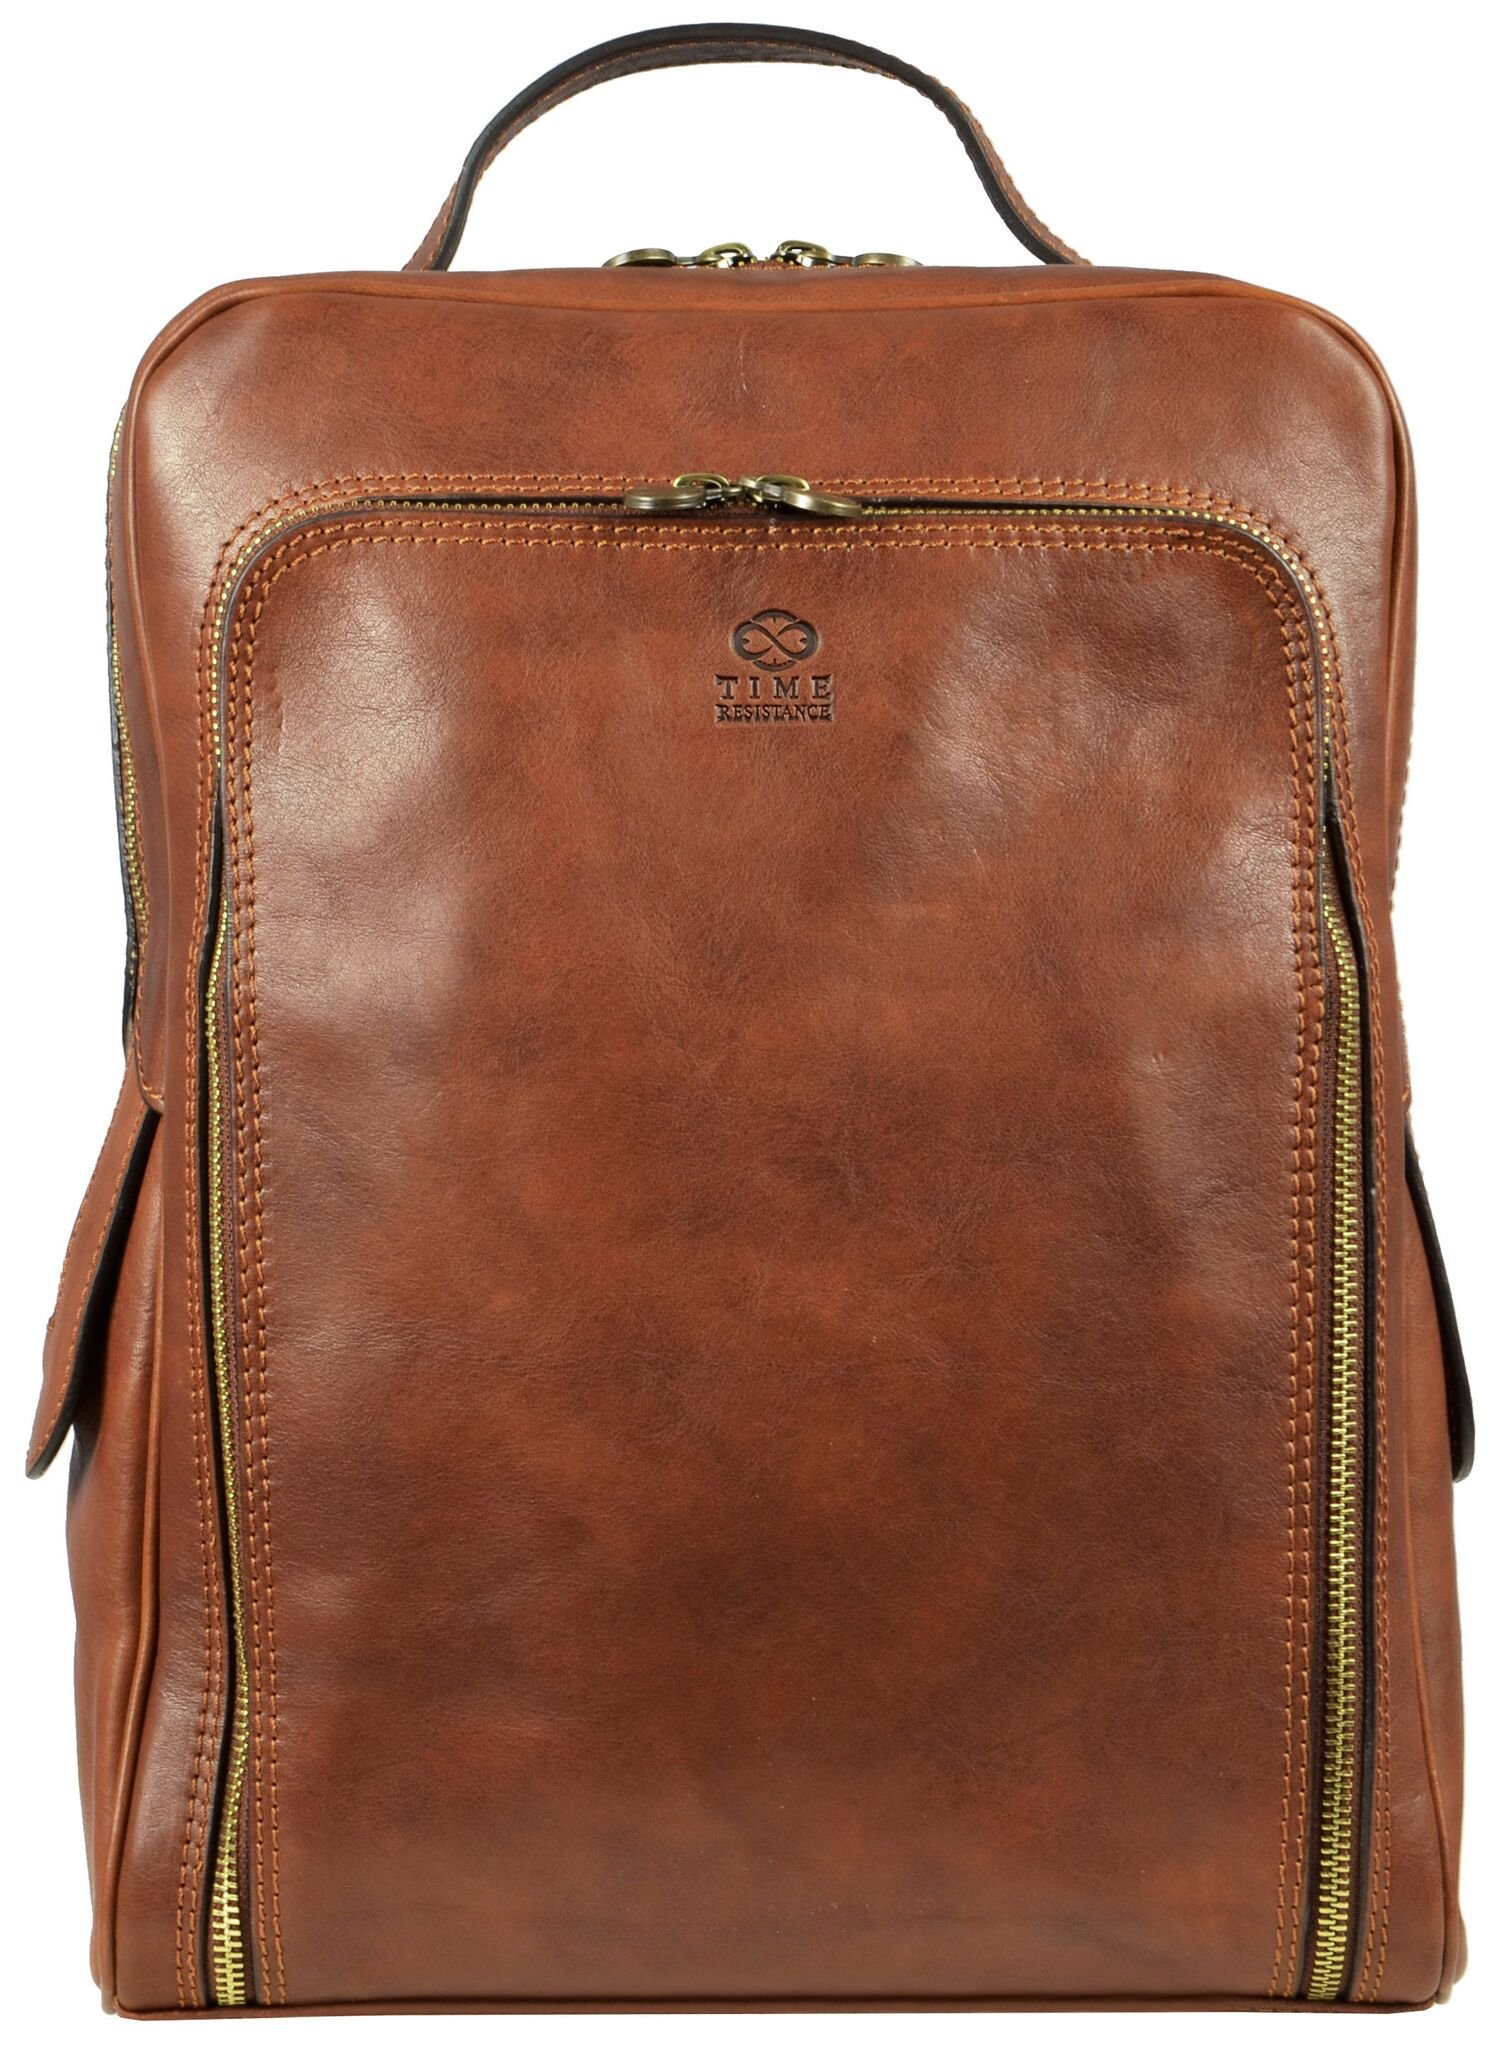 Leather Backpack Rucksack School Bag Unisex Matt Brown - Time Resistance